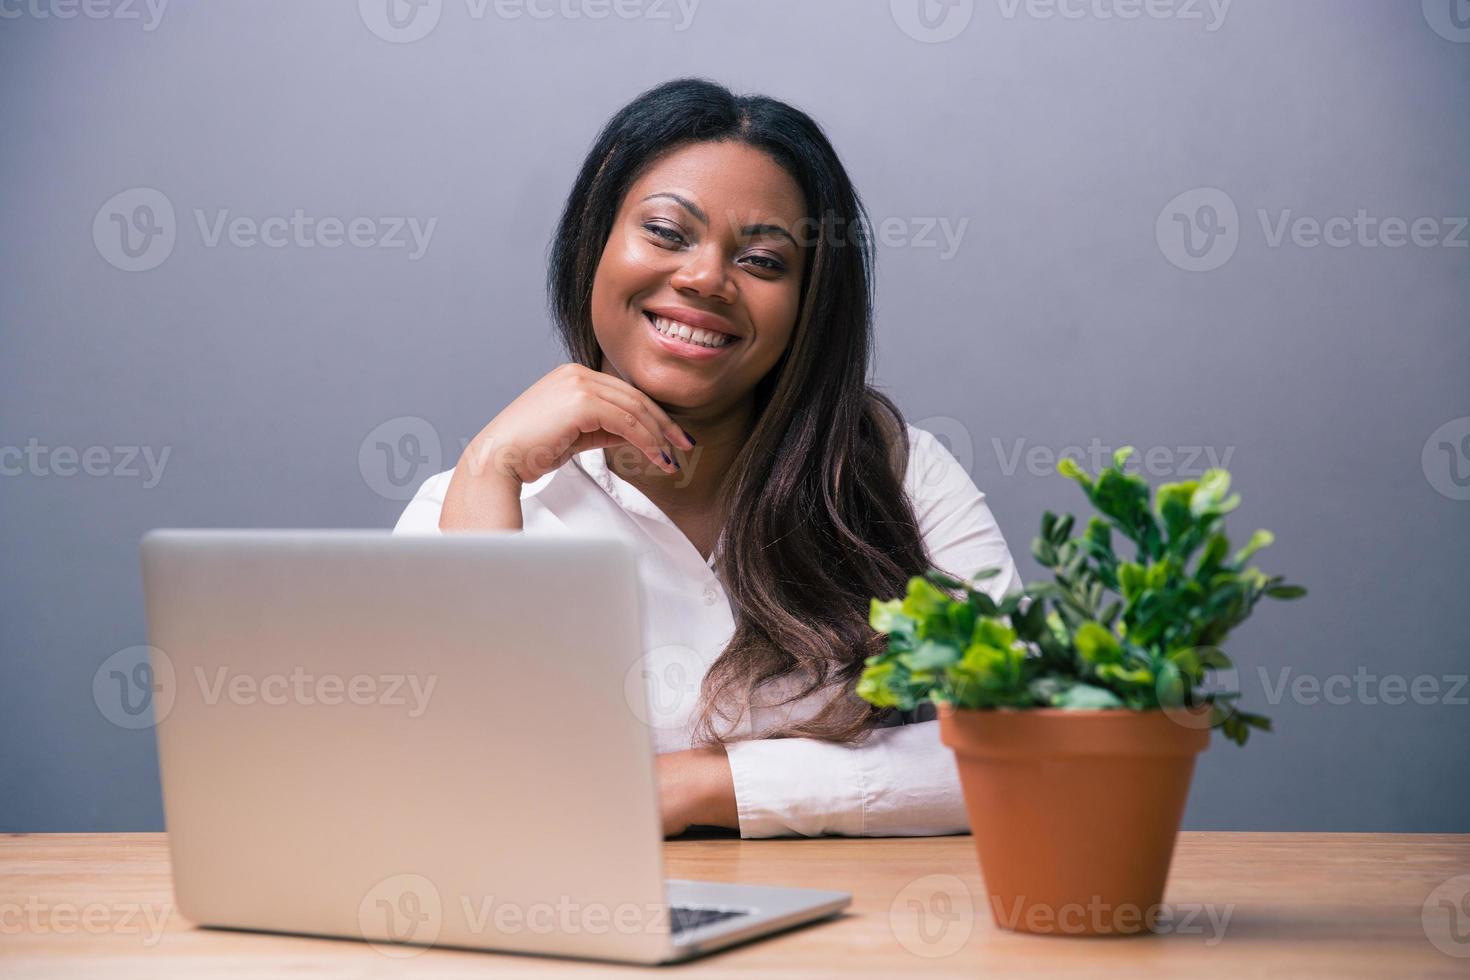 imprenditrice seduto al tavolo con il portatile foto